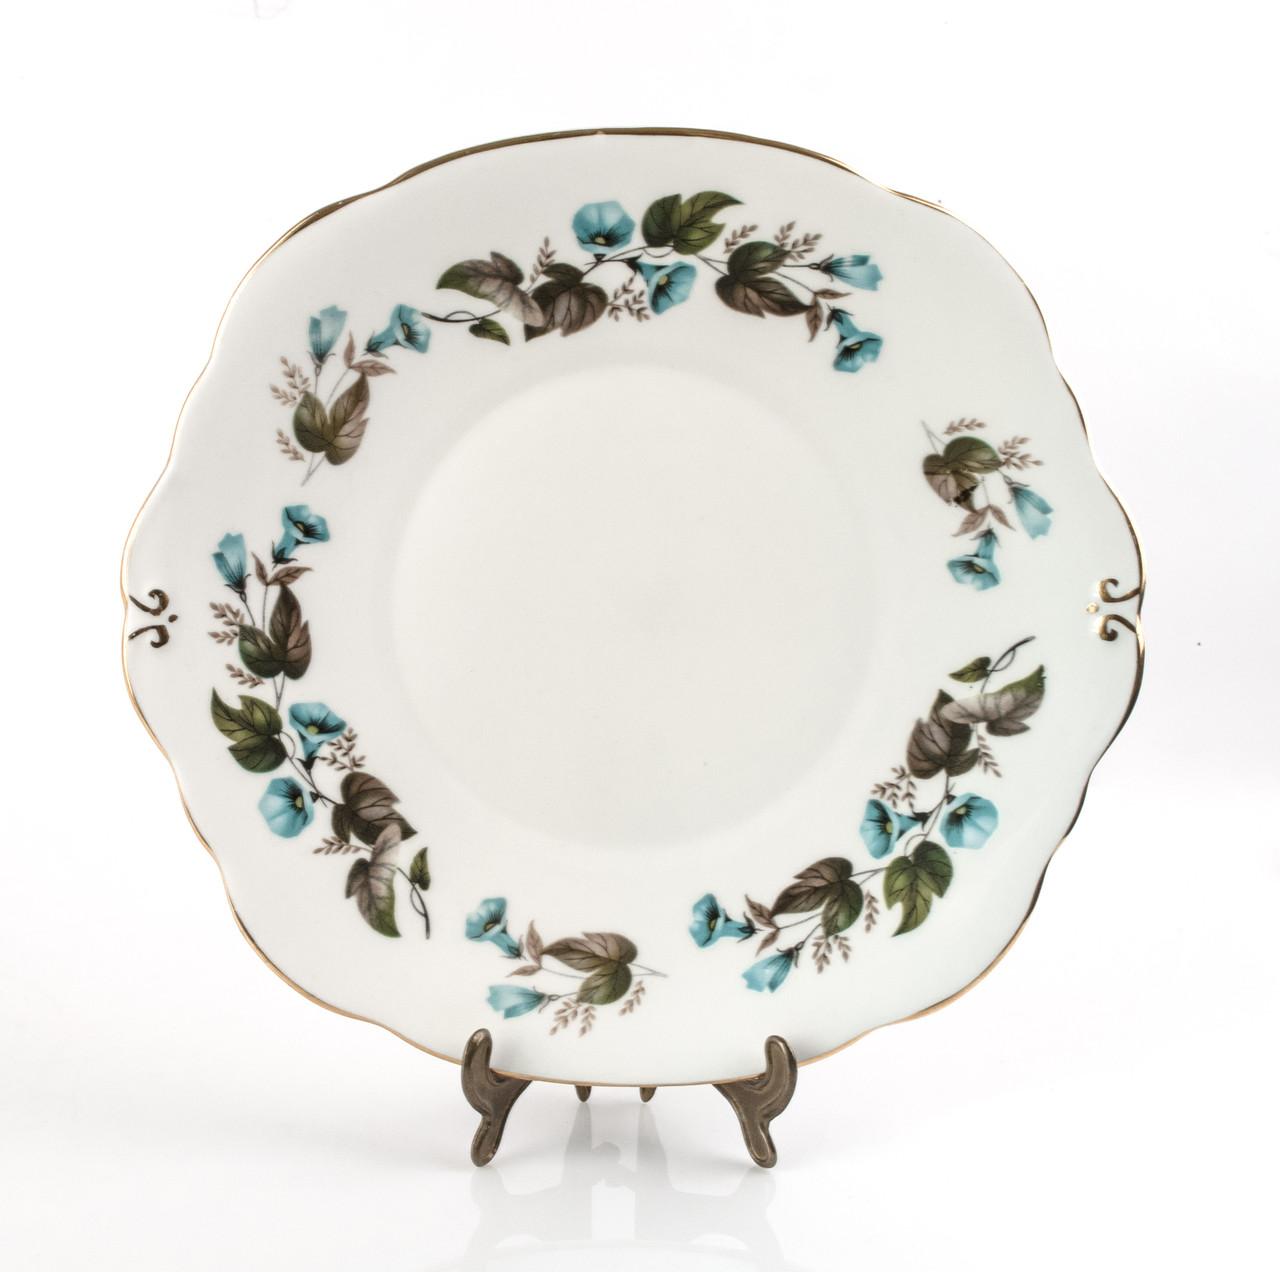 Тарелка, блюдо, костяной фарфор, Англия, Duches